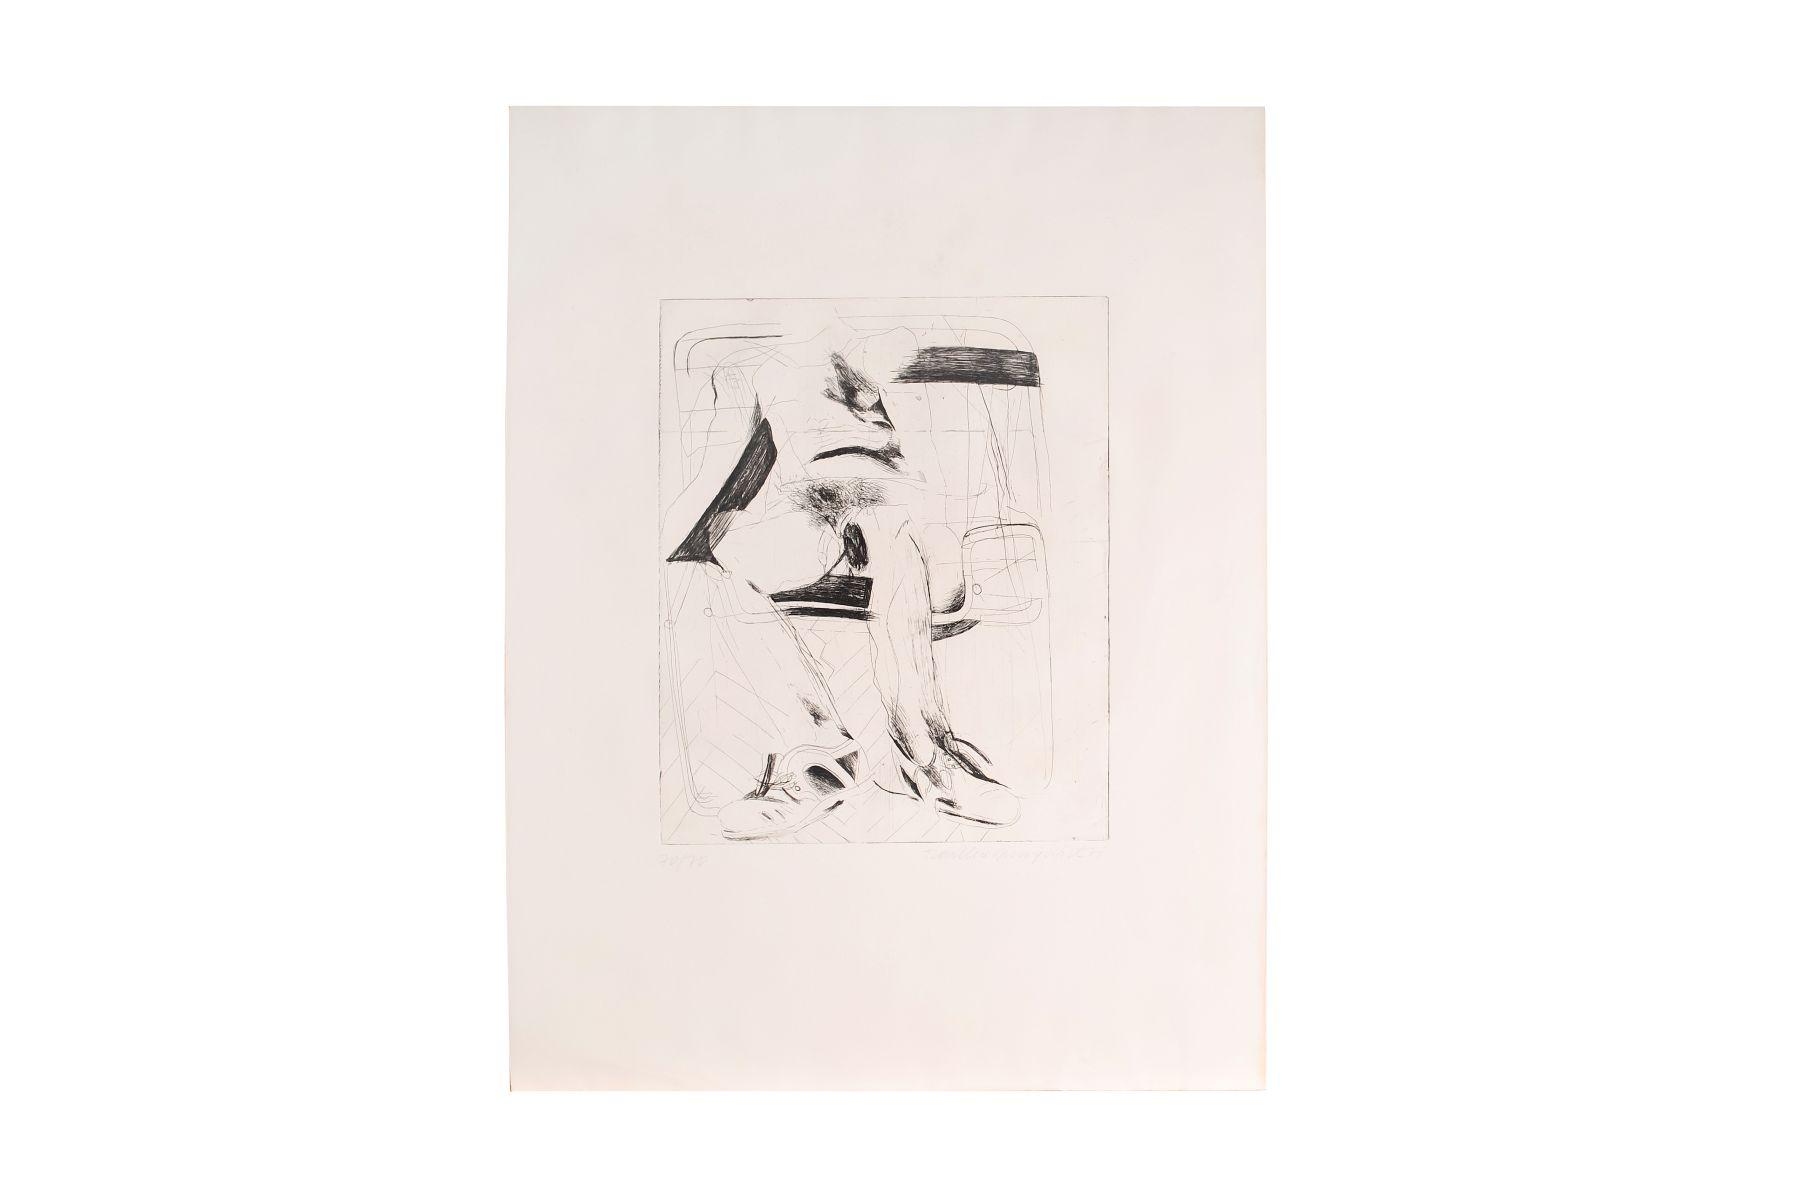 #89 Artist of the 20th century Image